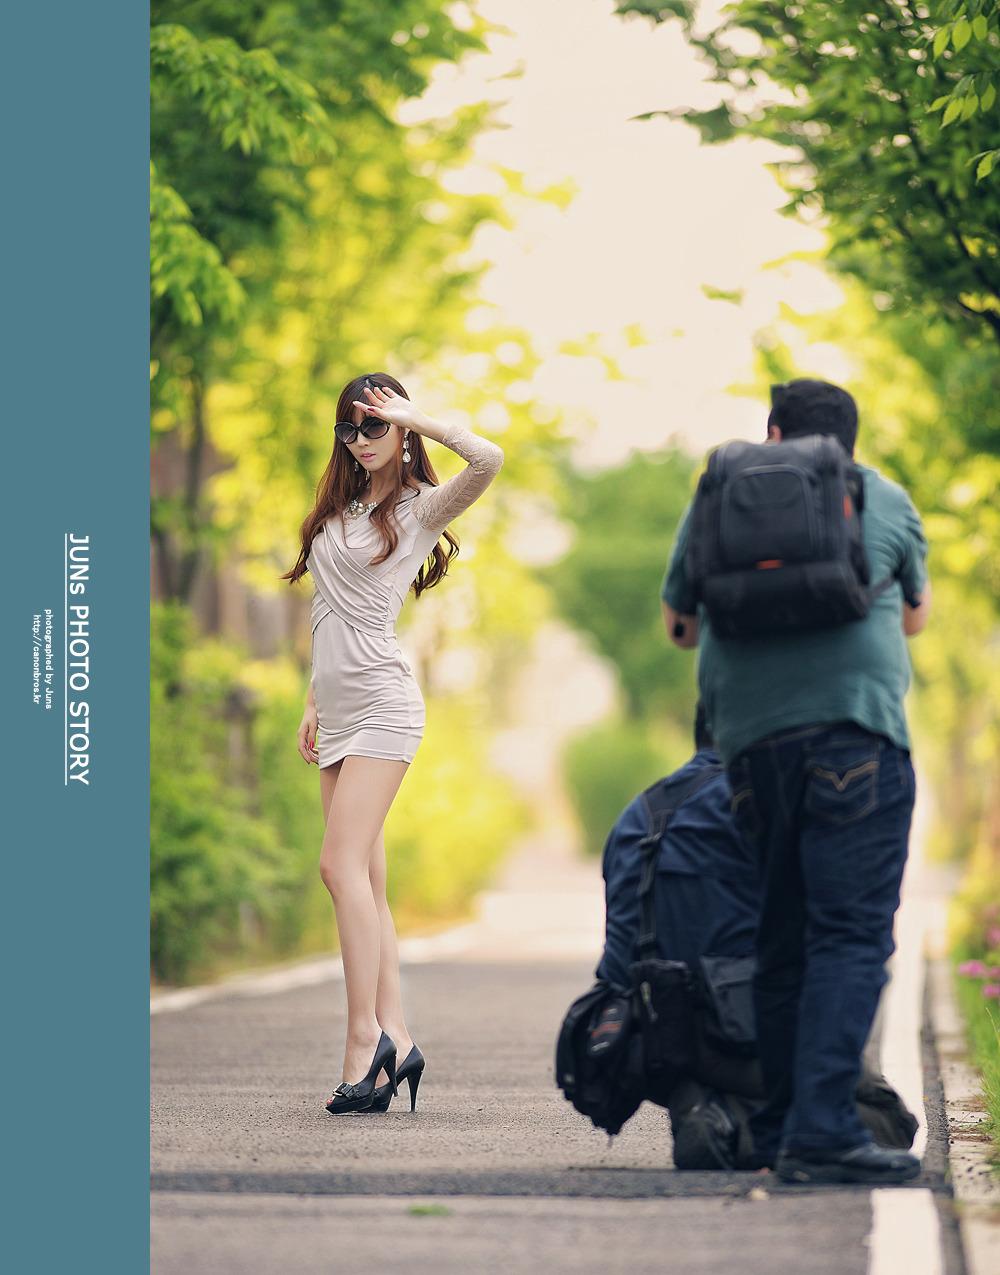 Manisnya Model Asal Korea - Pesona Kecantikan Model Seksi